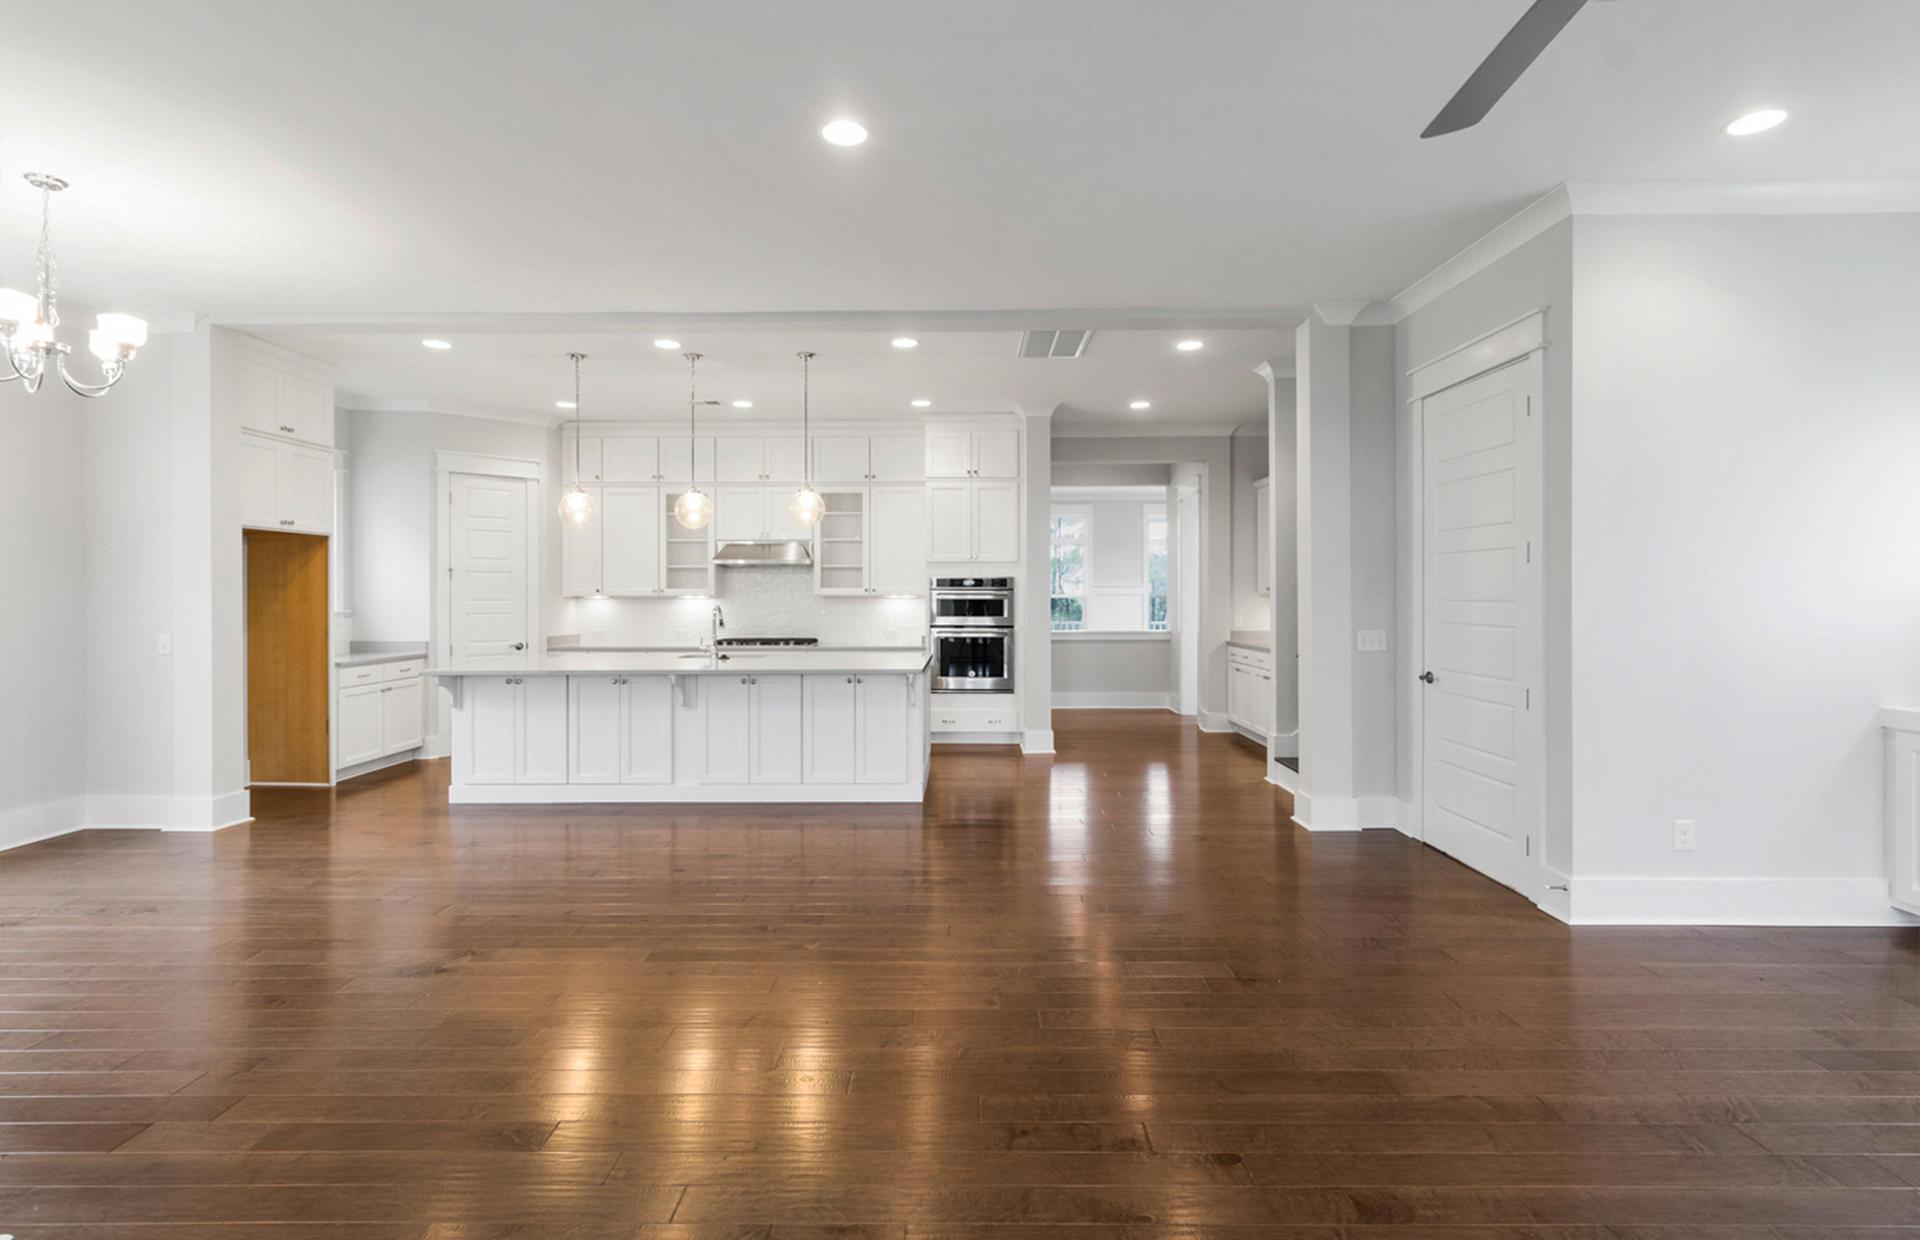 Dunes West Homes For Sale - 2324 Bucktail Court, Mount Pleasant, SC - 12